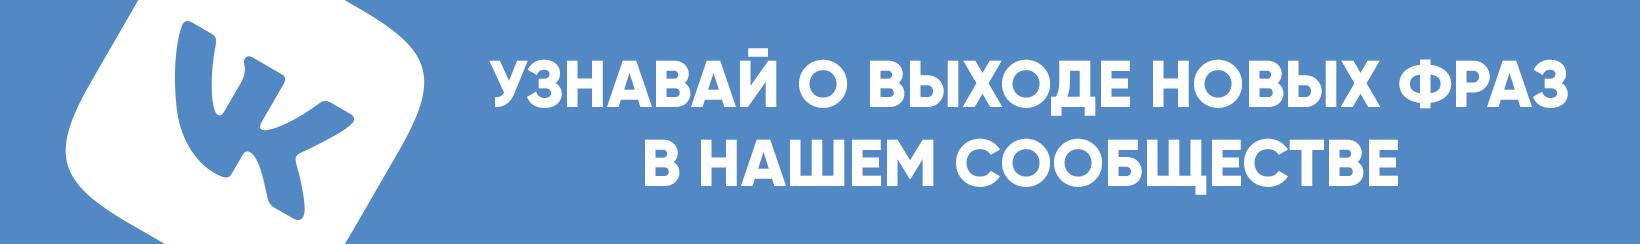 tsb_banner_vk